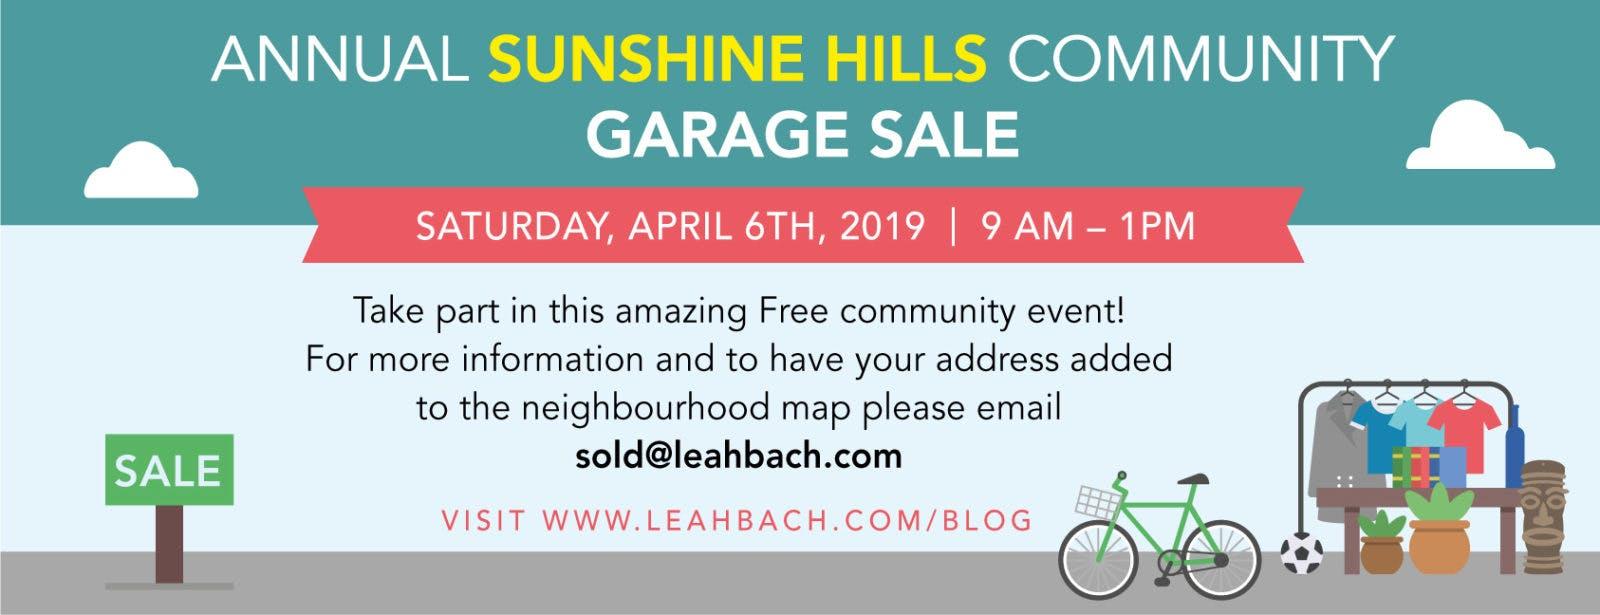 Annual Sunshine Hills Community Garage Sale Leah Bach Personal